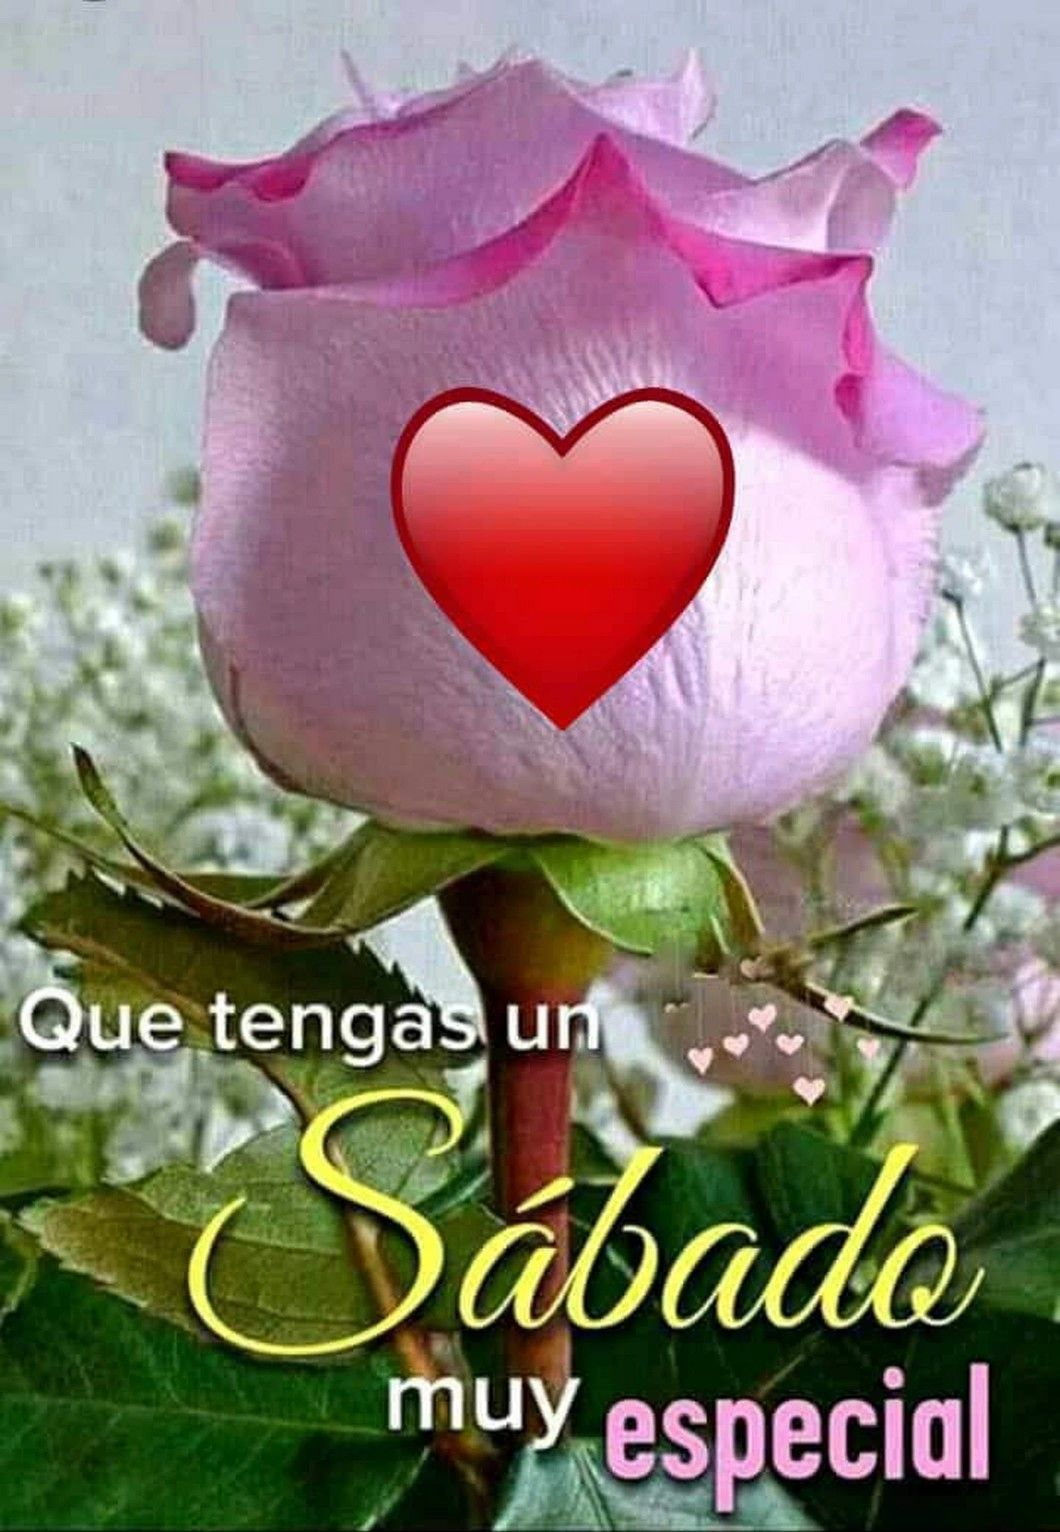 Feliz Sabado Buenos Dias Con Rosas Saludos De Buenos Dias